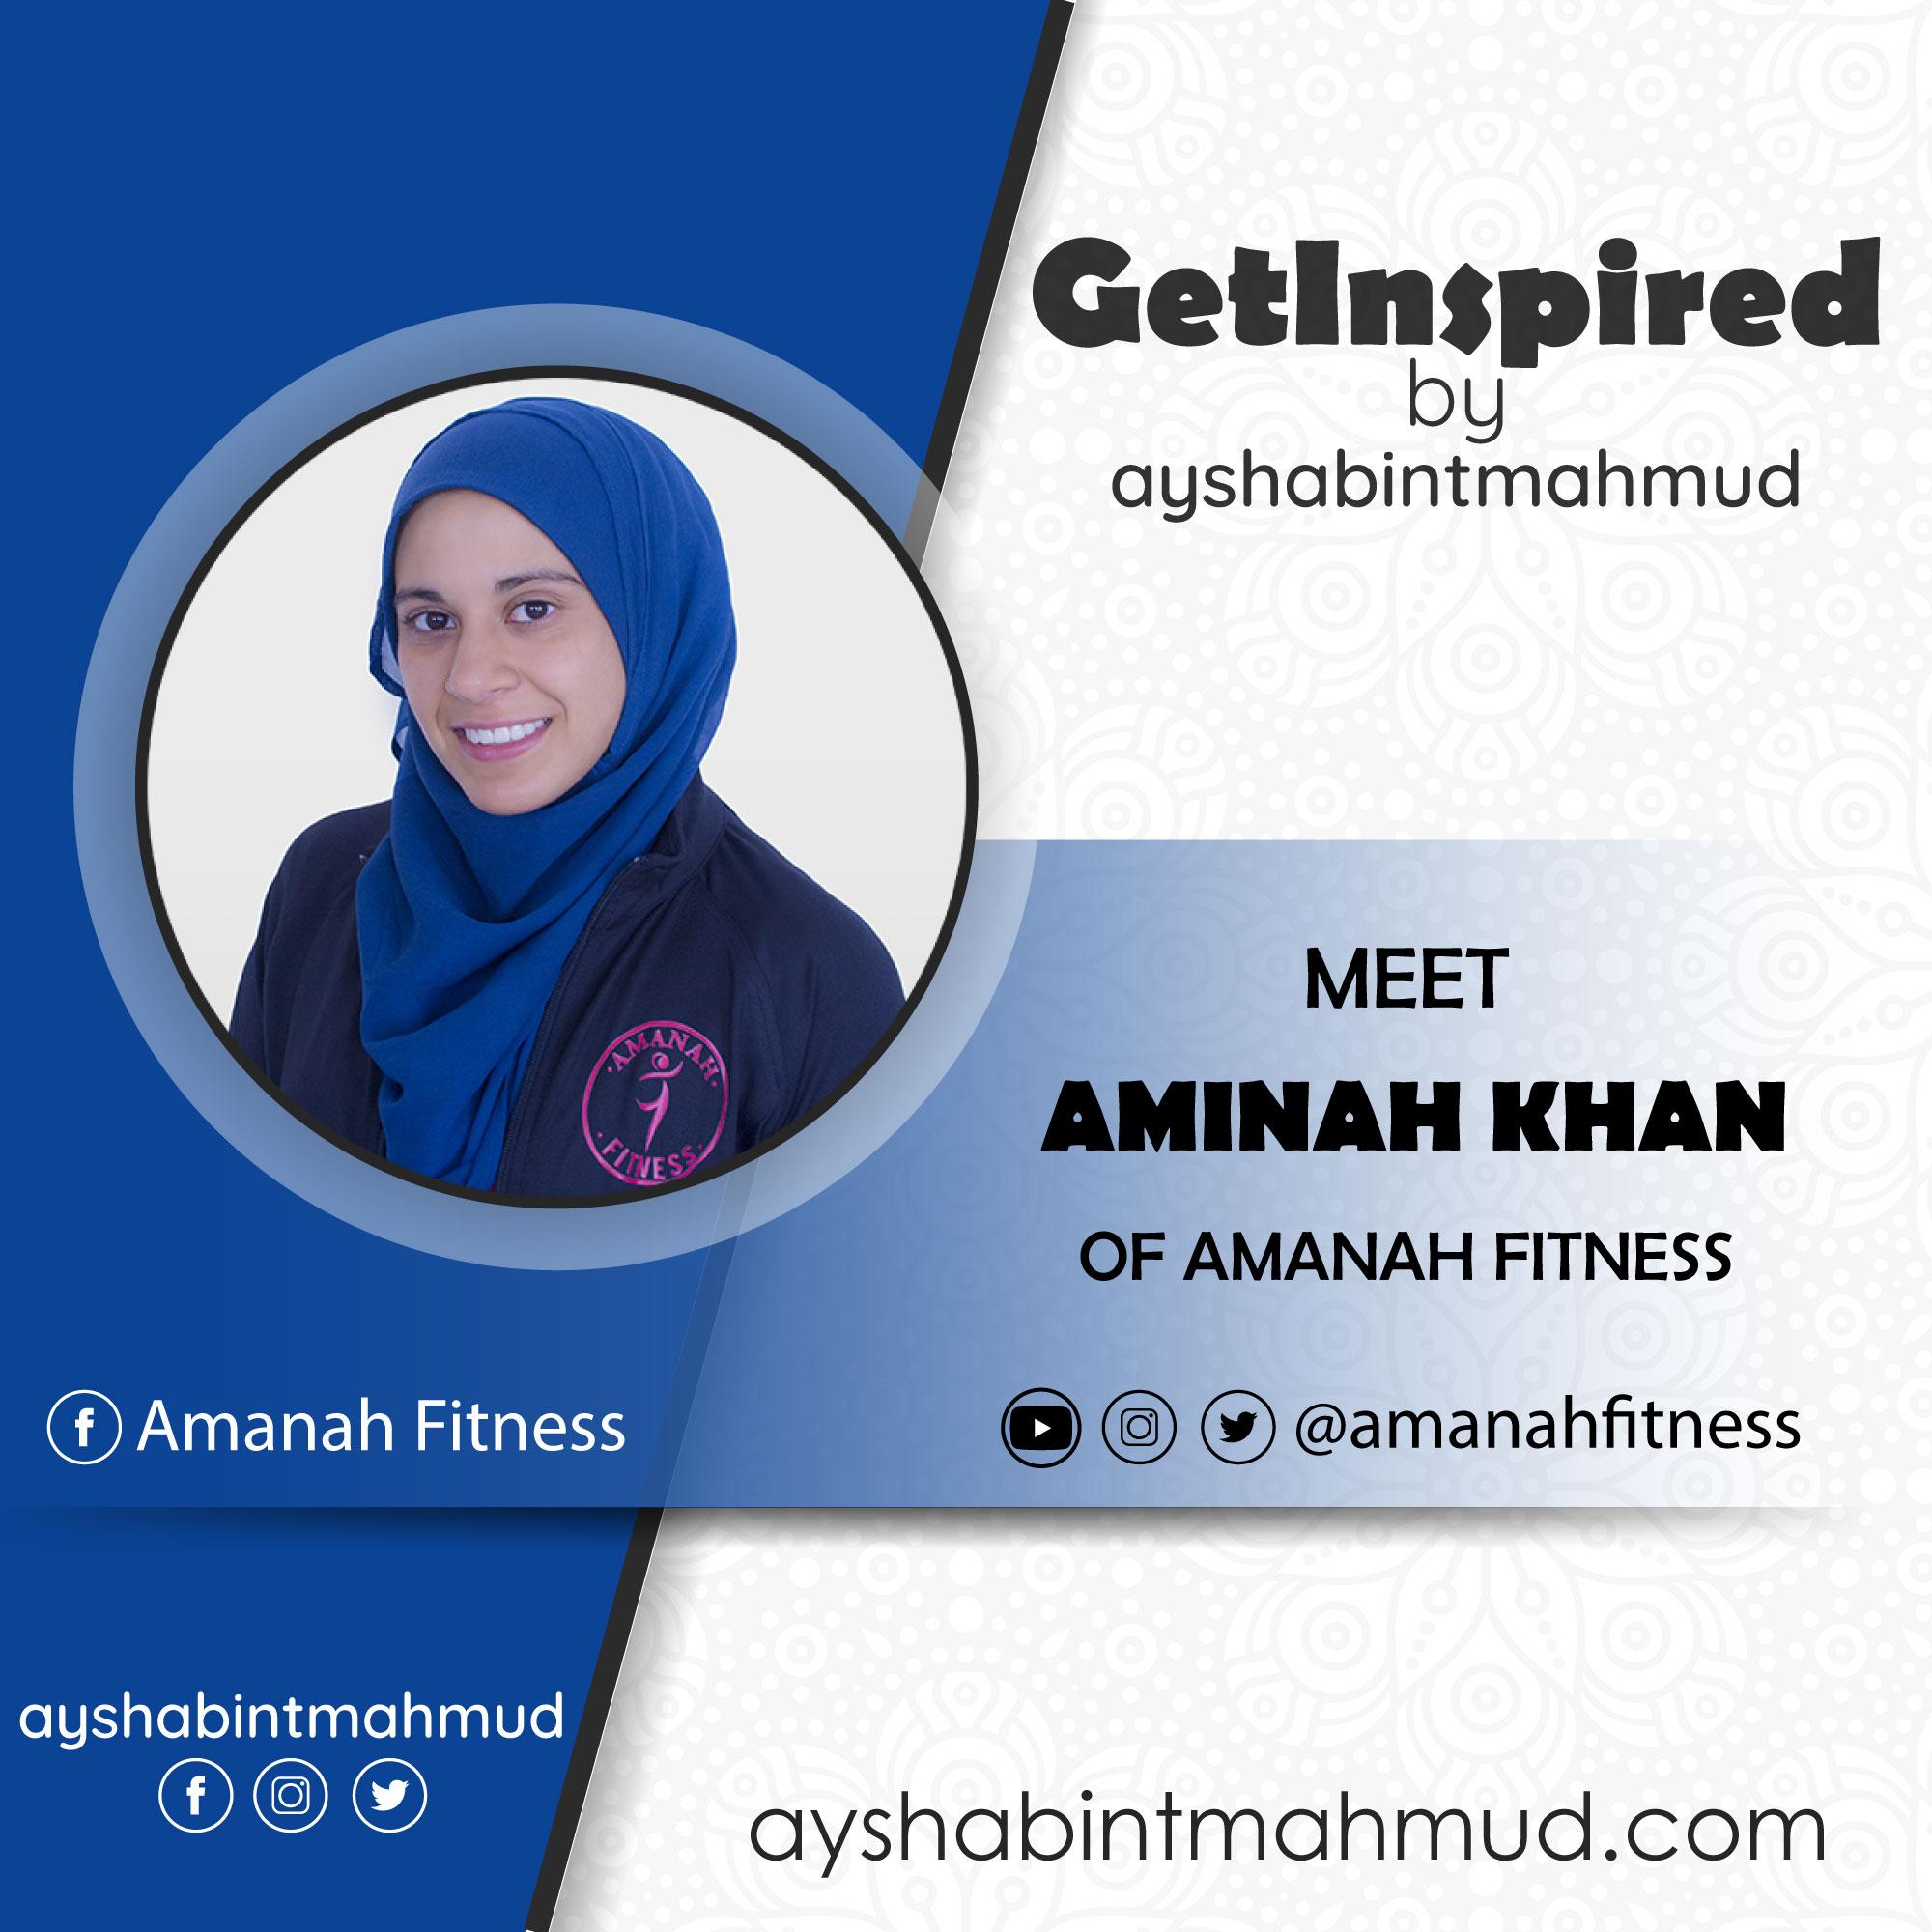 Amina Khan